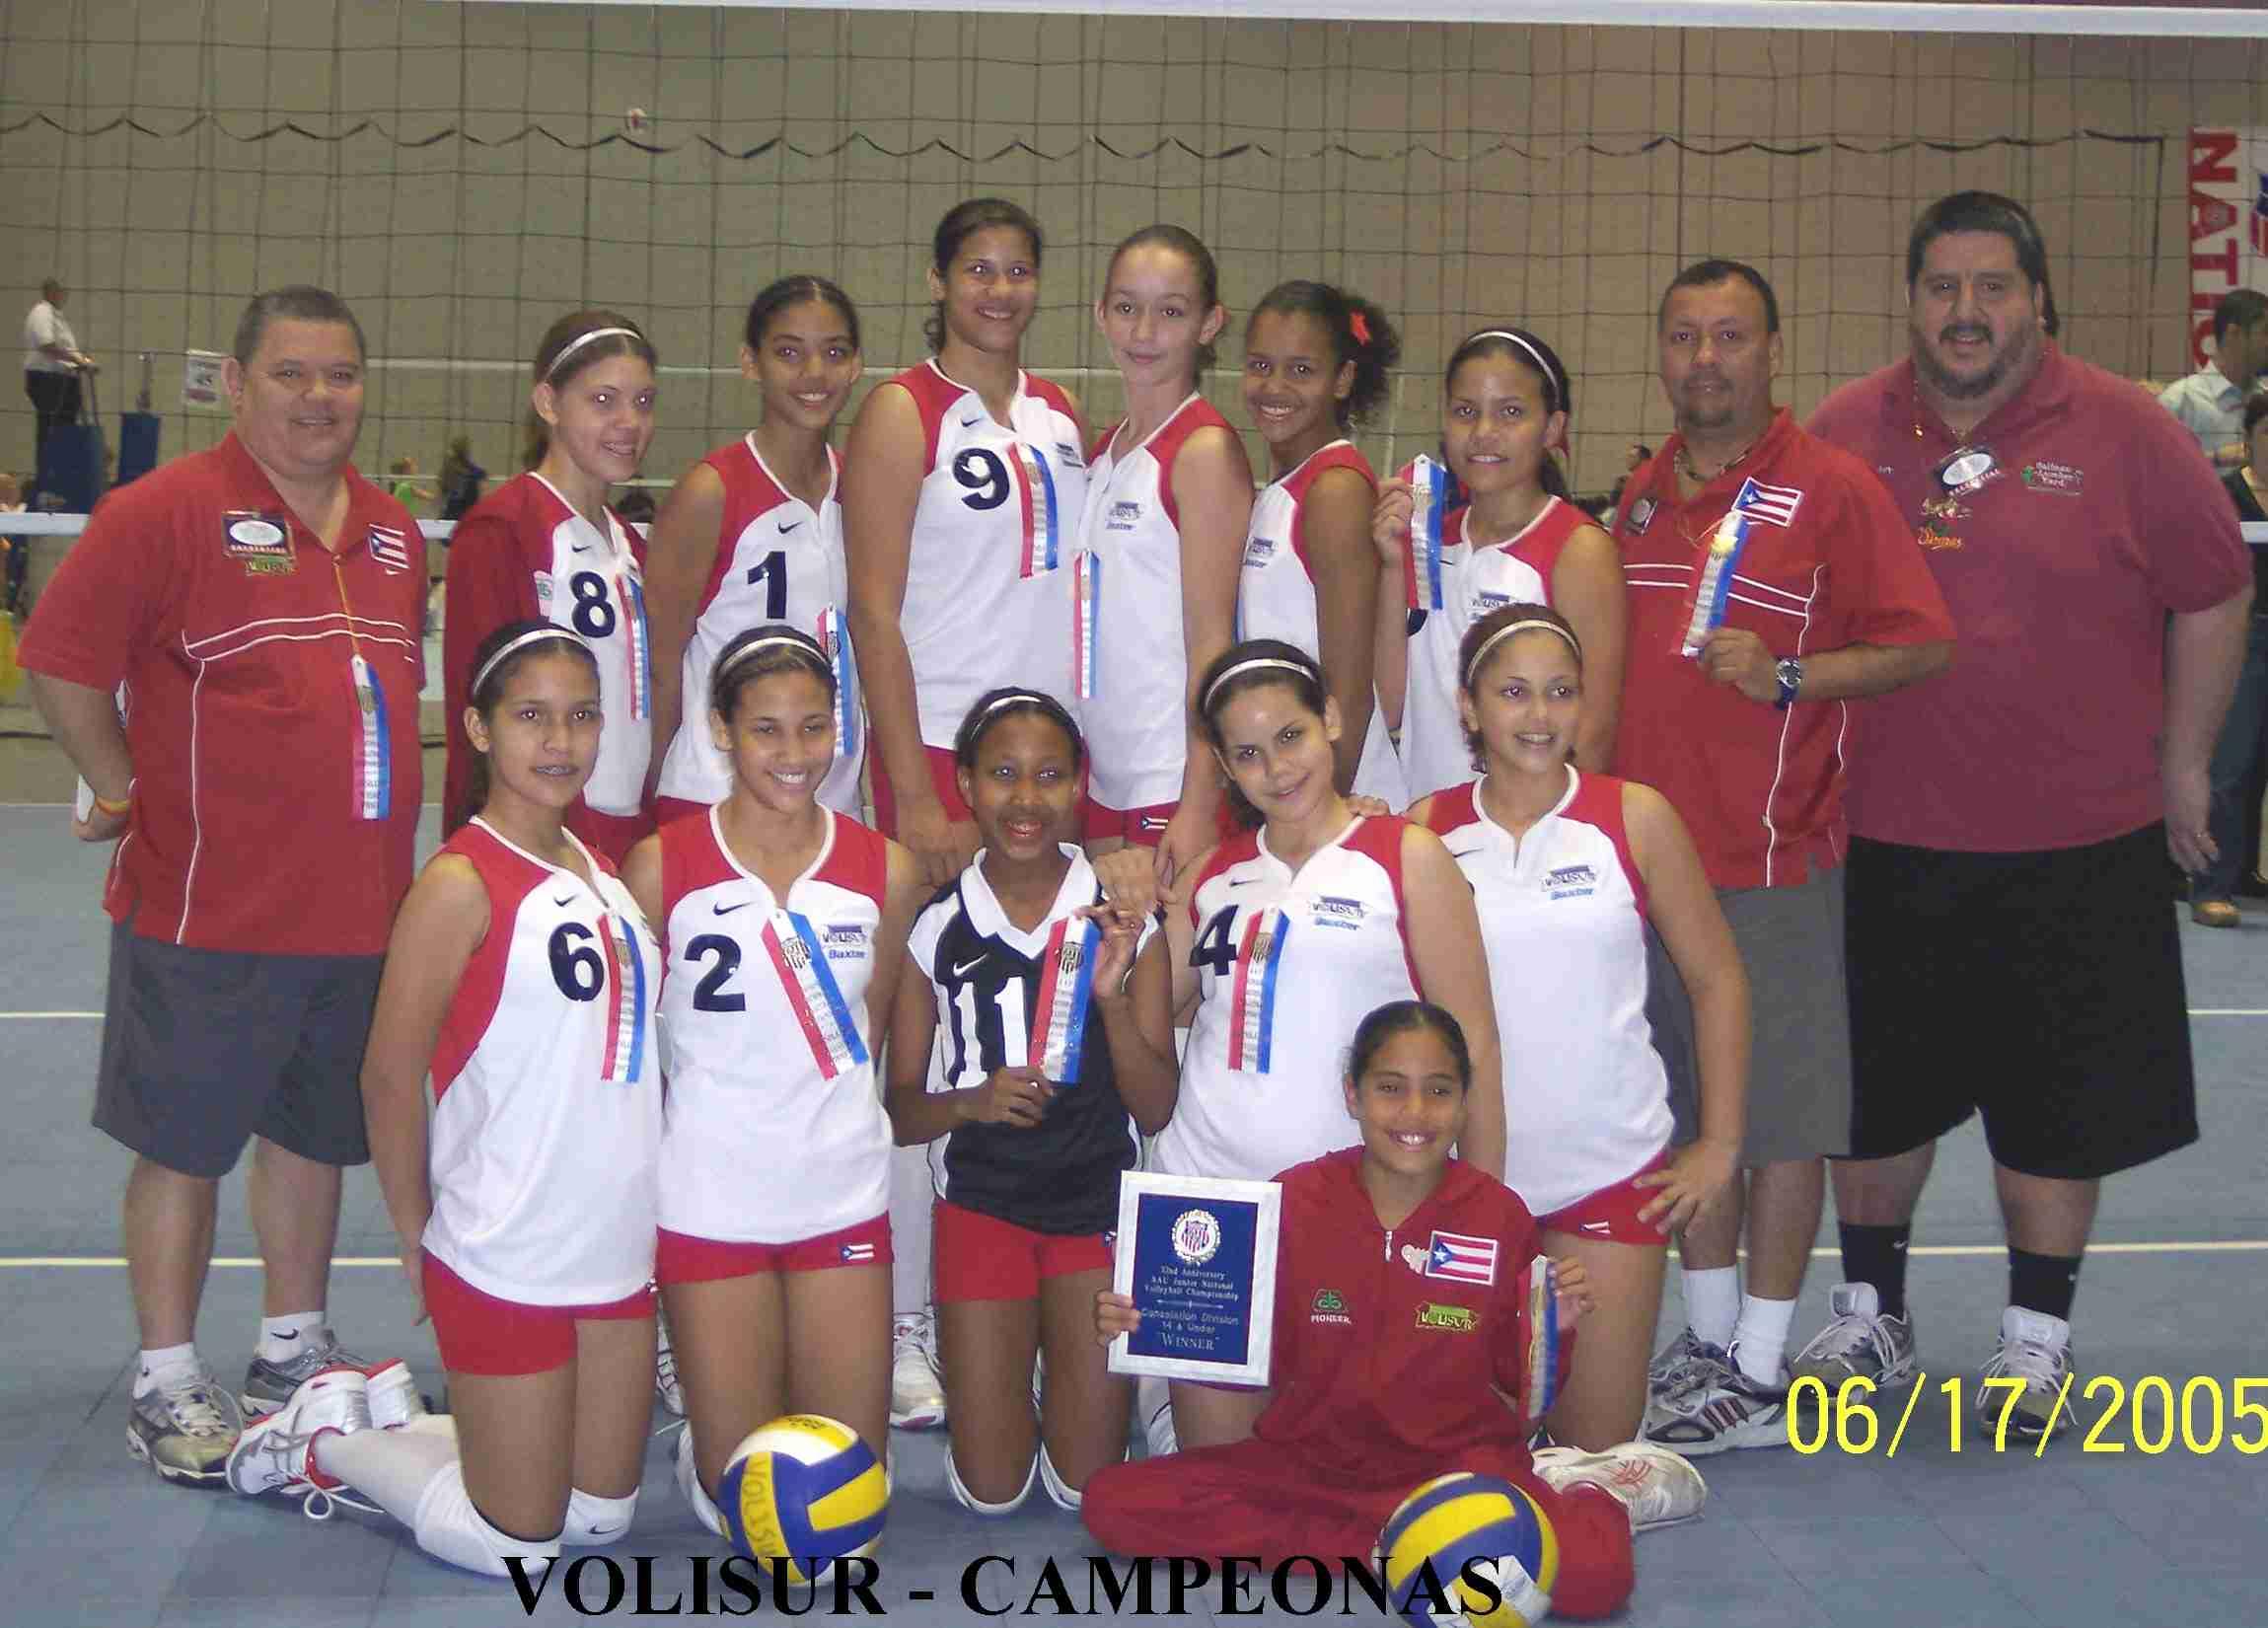 AAU Disney Campeonas 2005